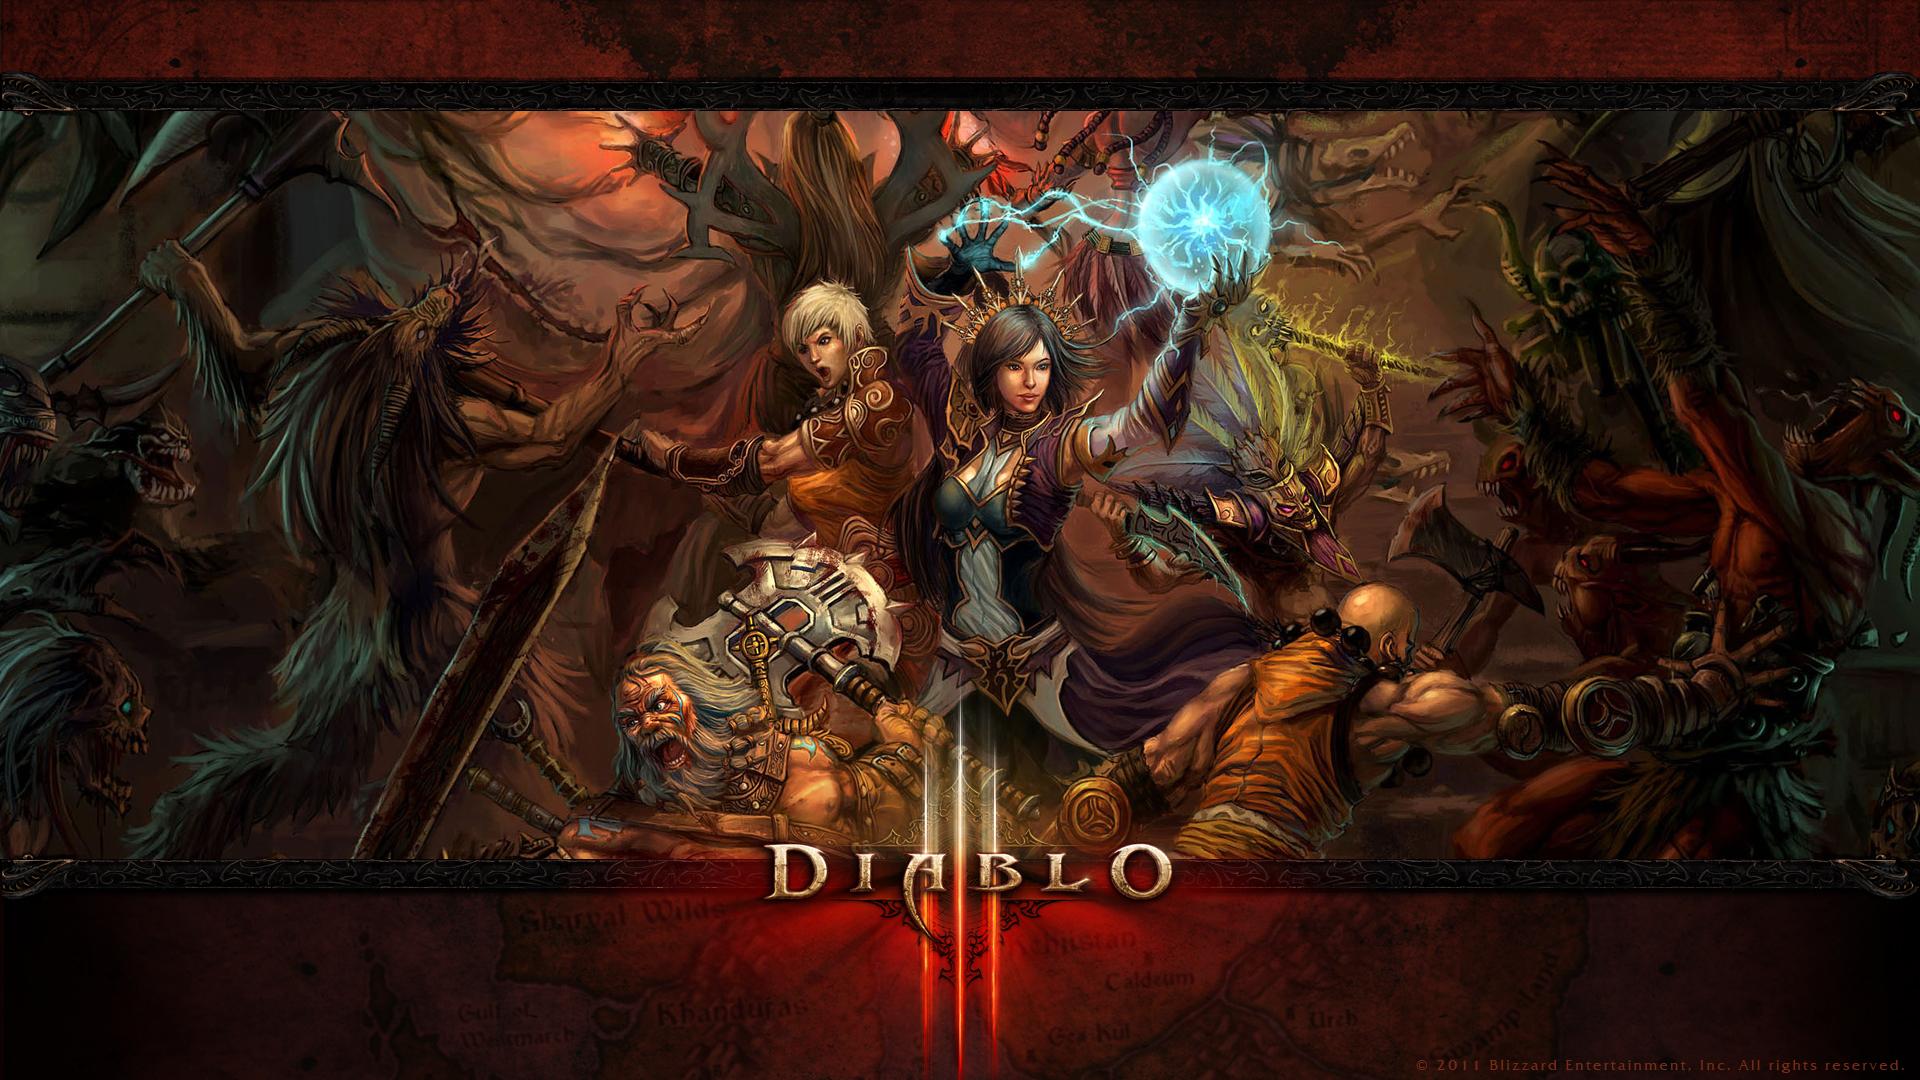 Diablo III - KeyArt Wallpaper Full HD - 1920x1080 - Classes em Combate